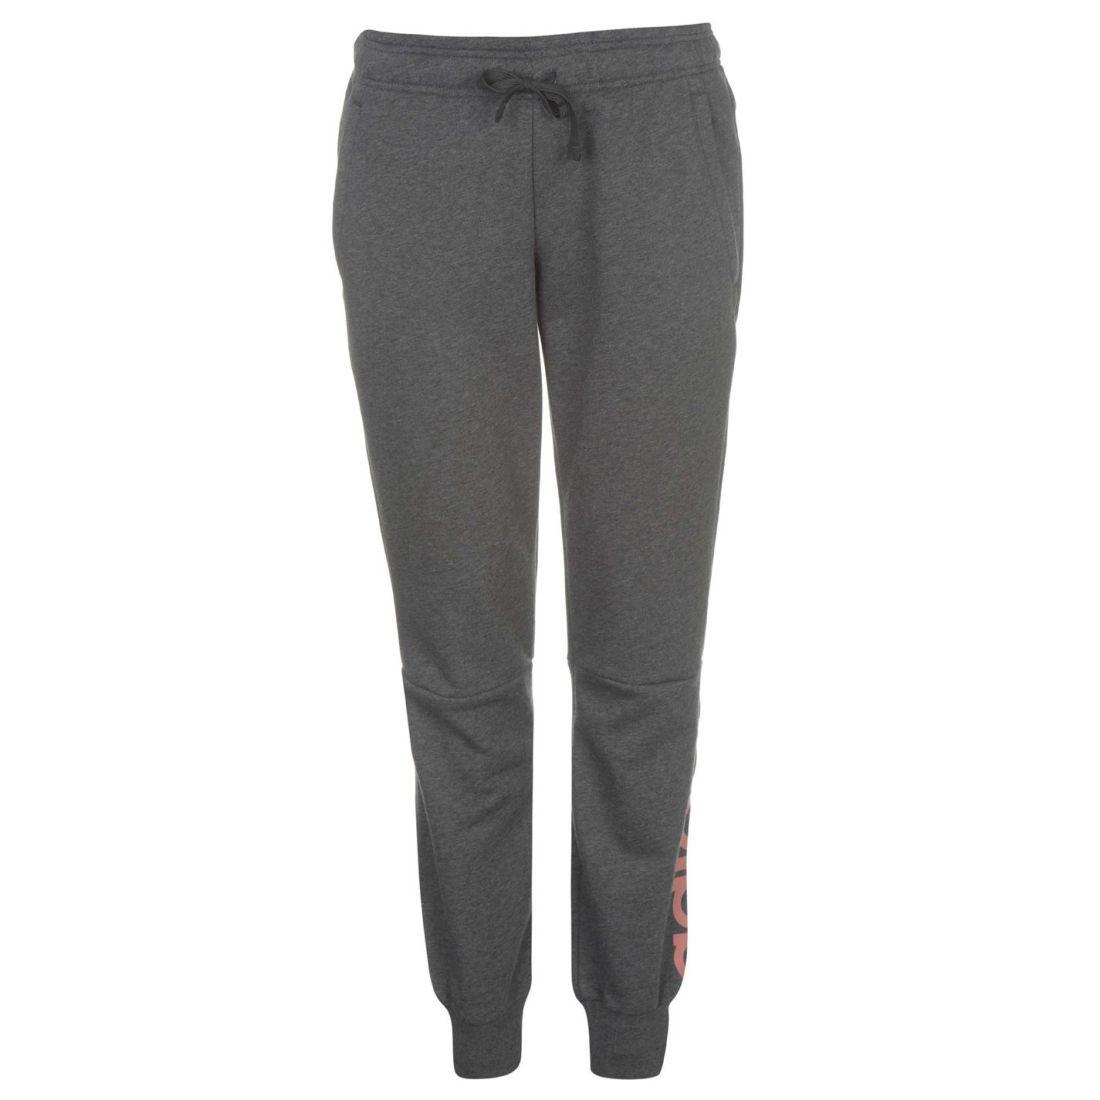 a2e444611f2b adidas Linear Closed Hem Sweat Pants Ladies Fleece Jogging Bottoms ...